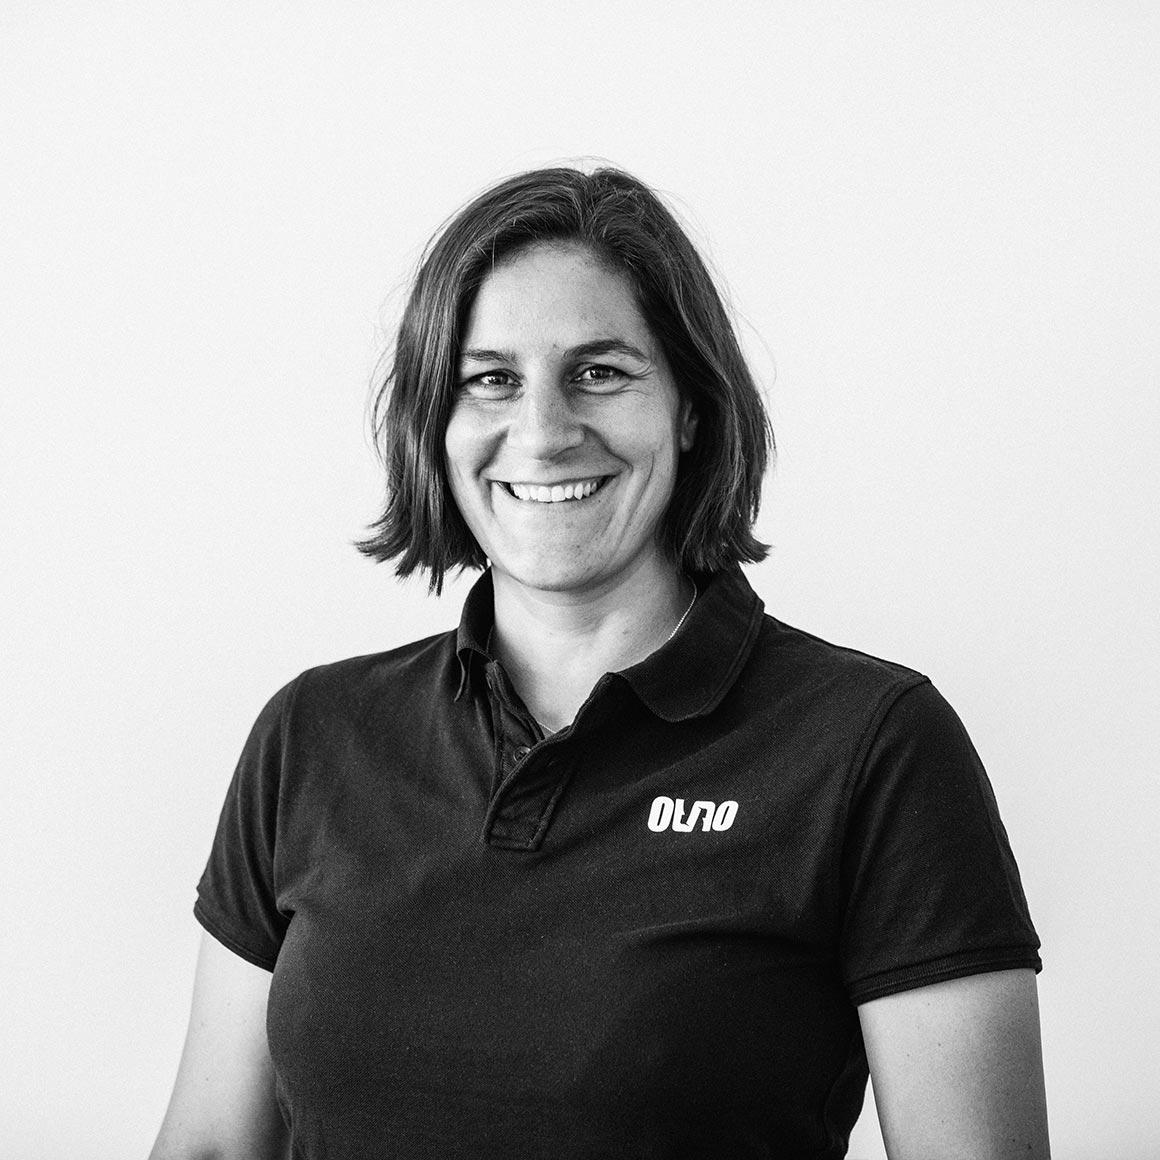 Profil von Christine Strobl